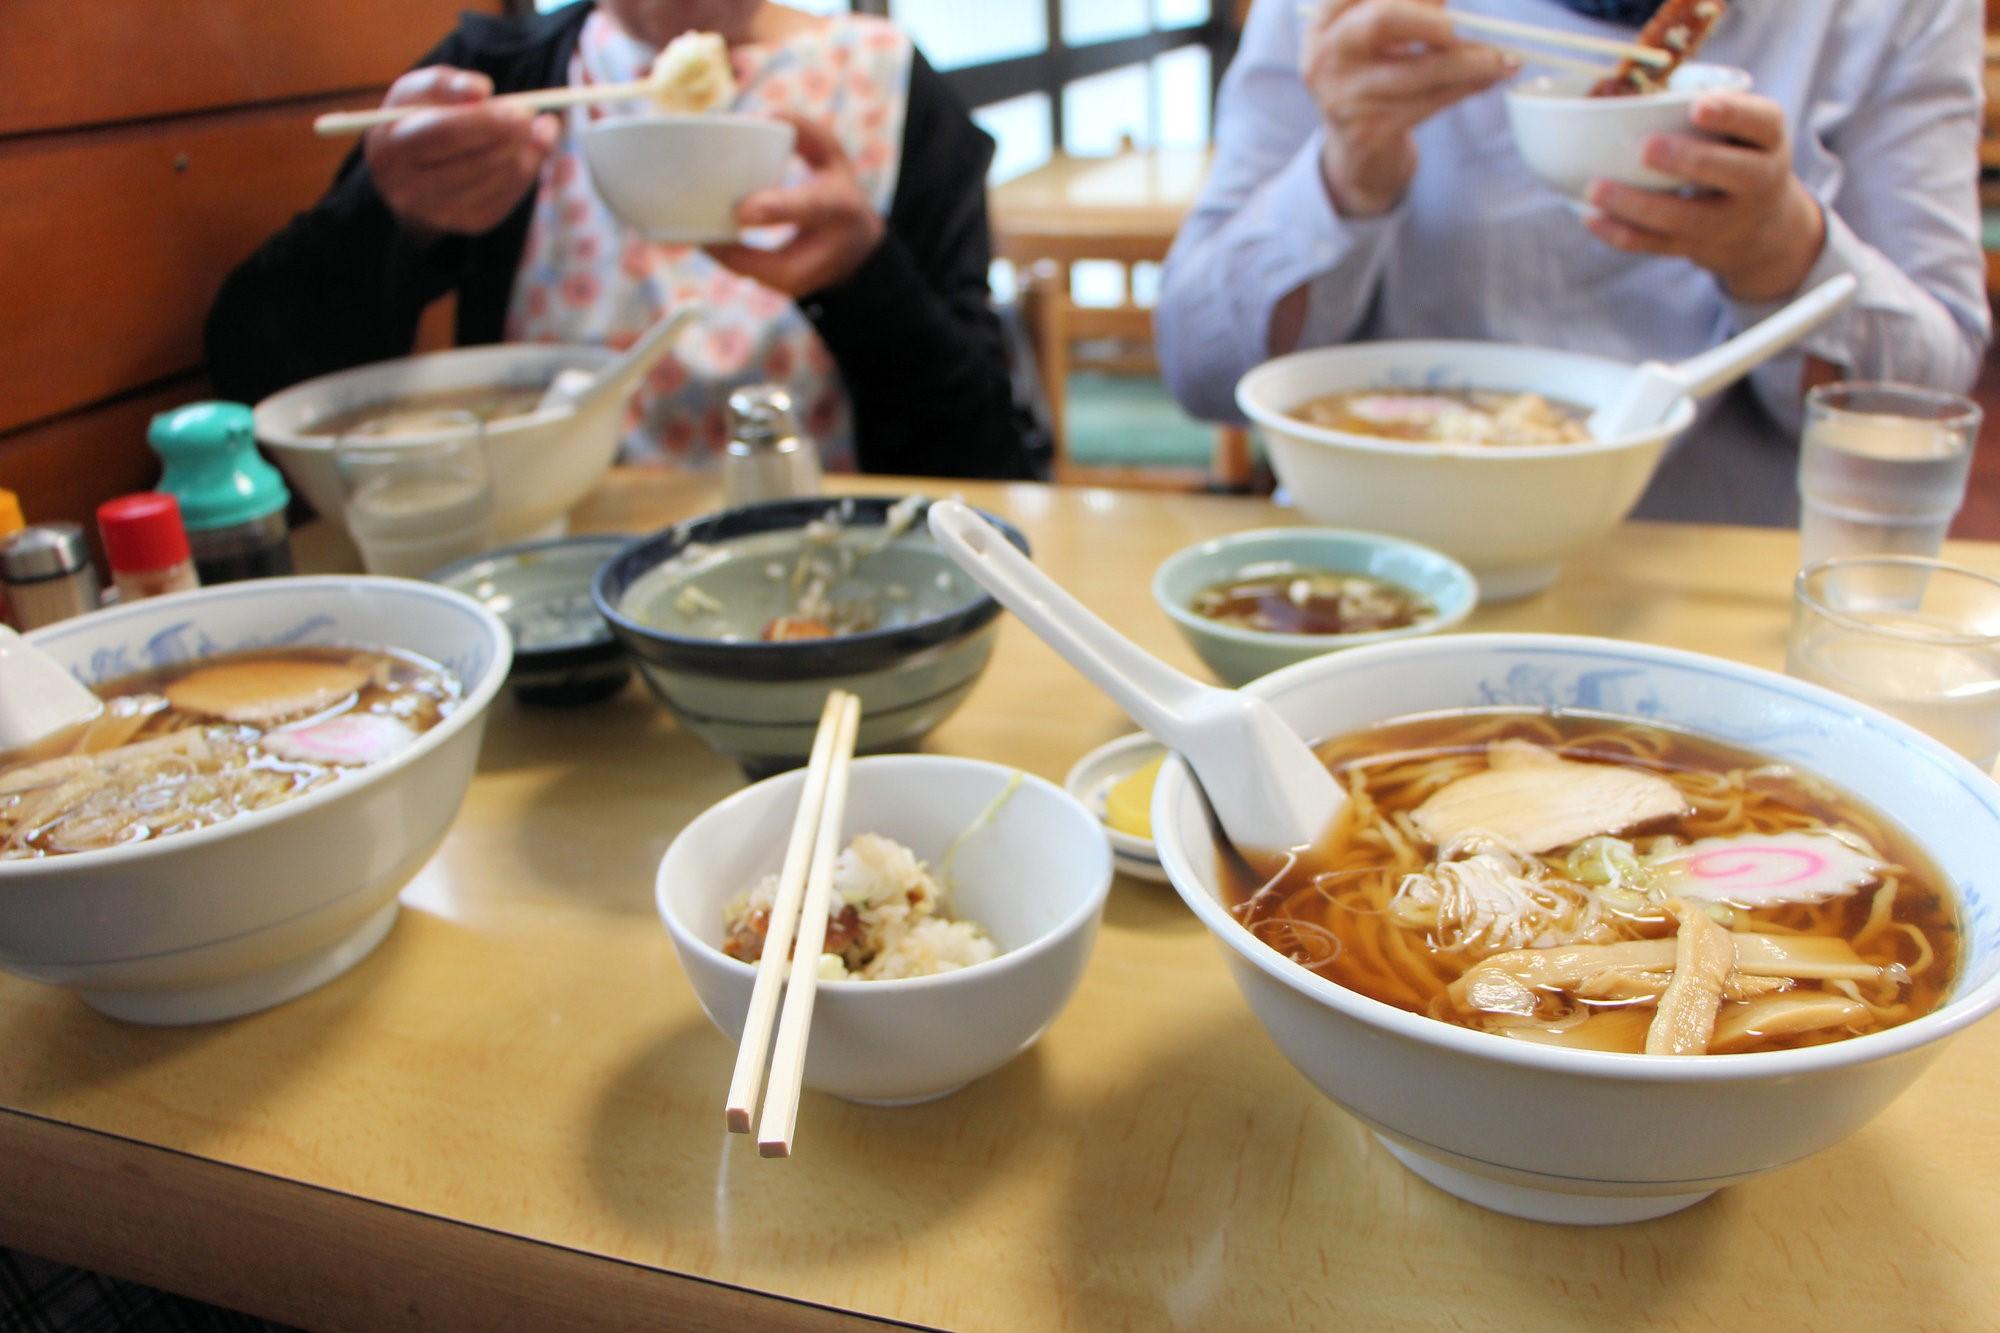 Aizu Ramen, a speciality dish of Aizu-Wakamatsu